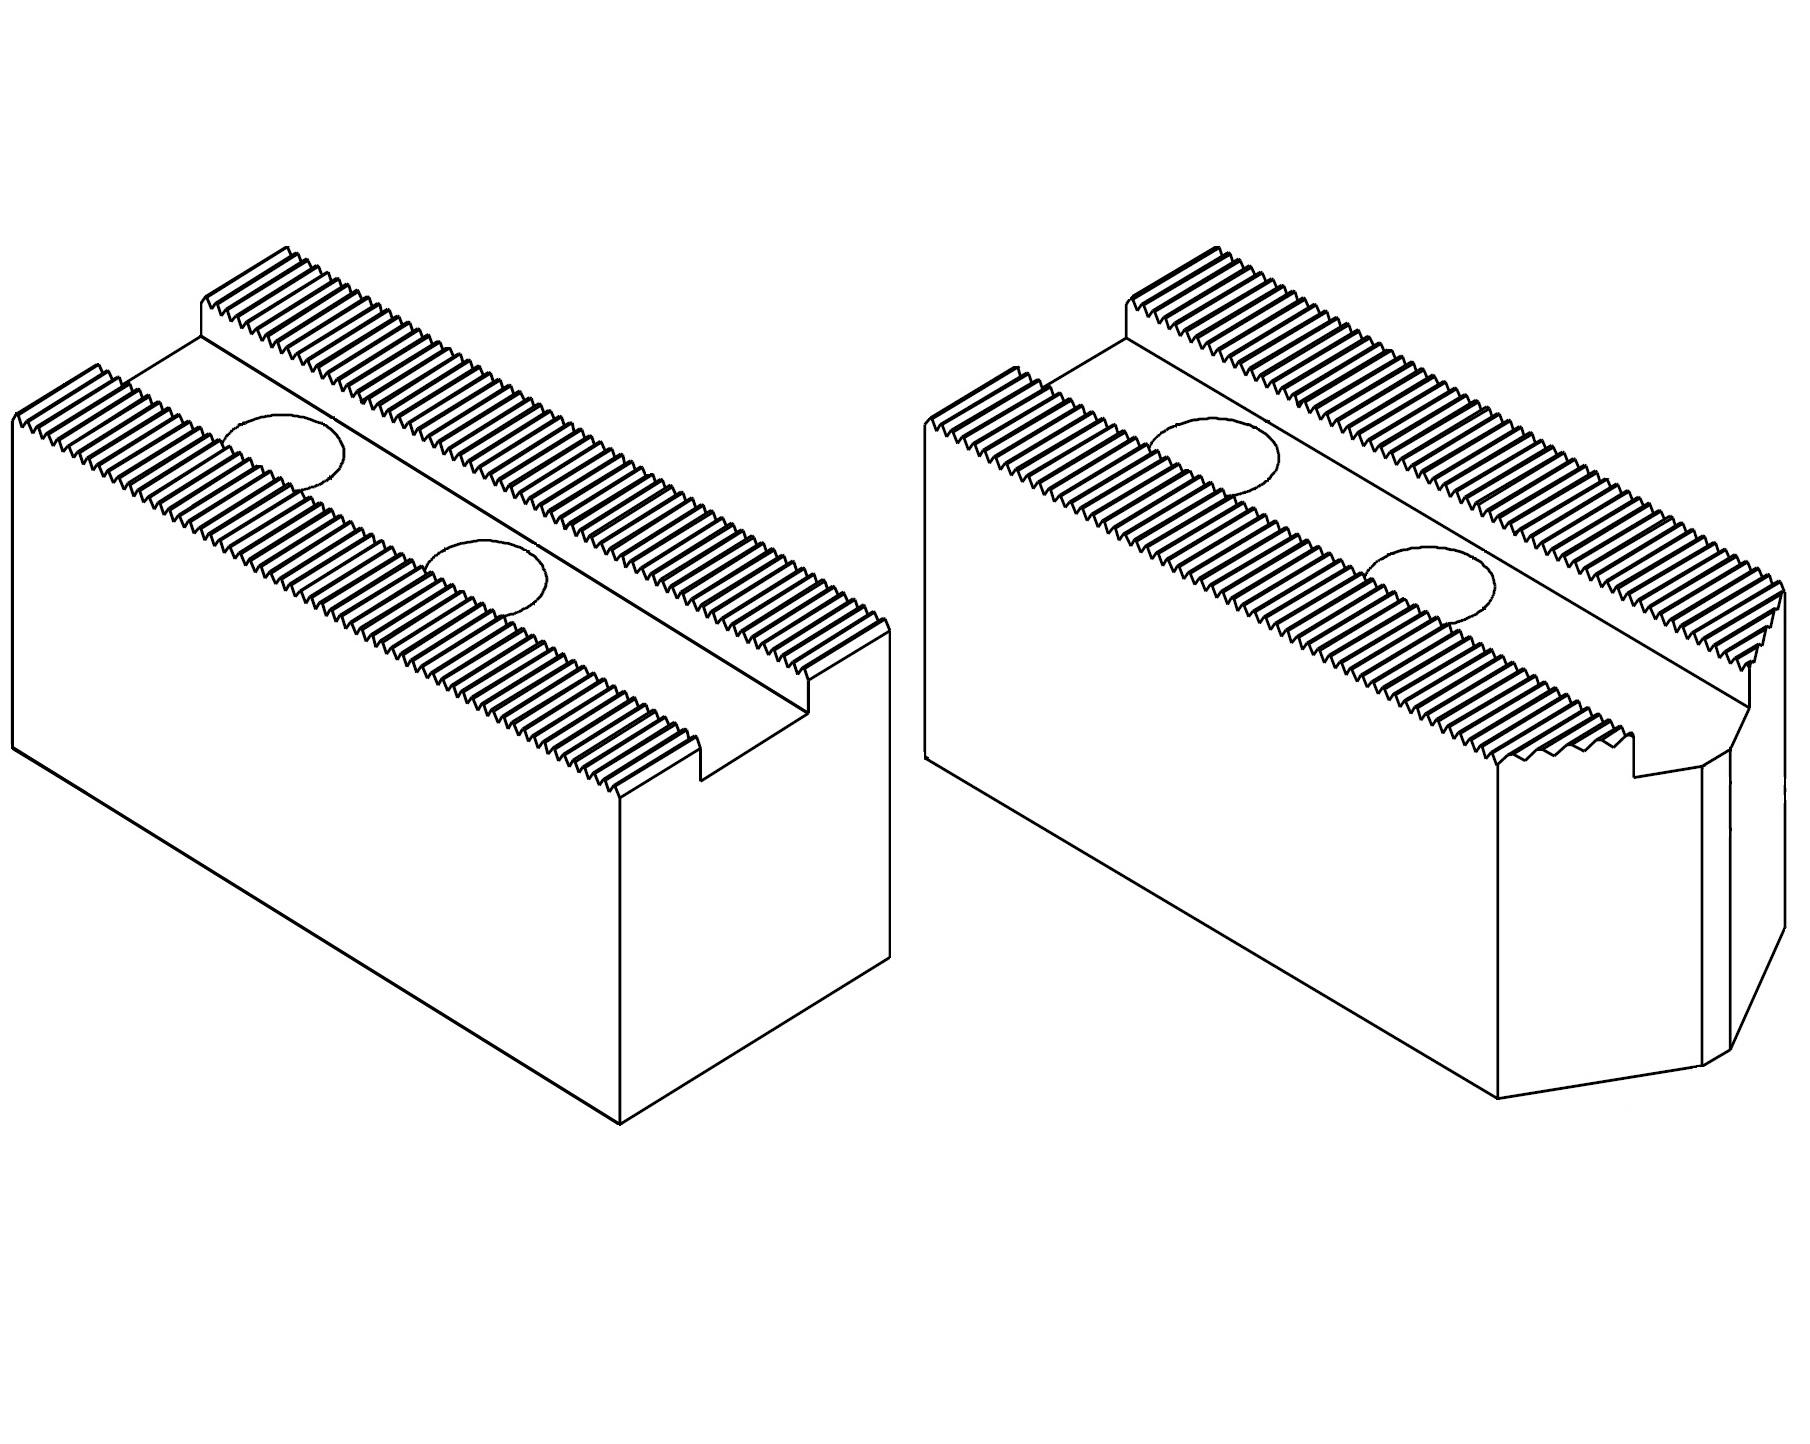 "Čelisti měkké 1/16""x90°, šířka drážky - 10 (sklíčidla pr. 110 - 140 mm)"